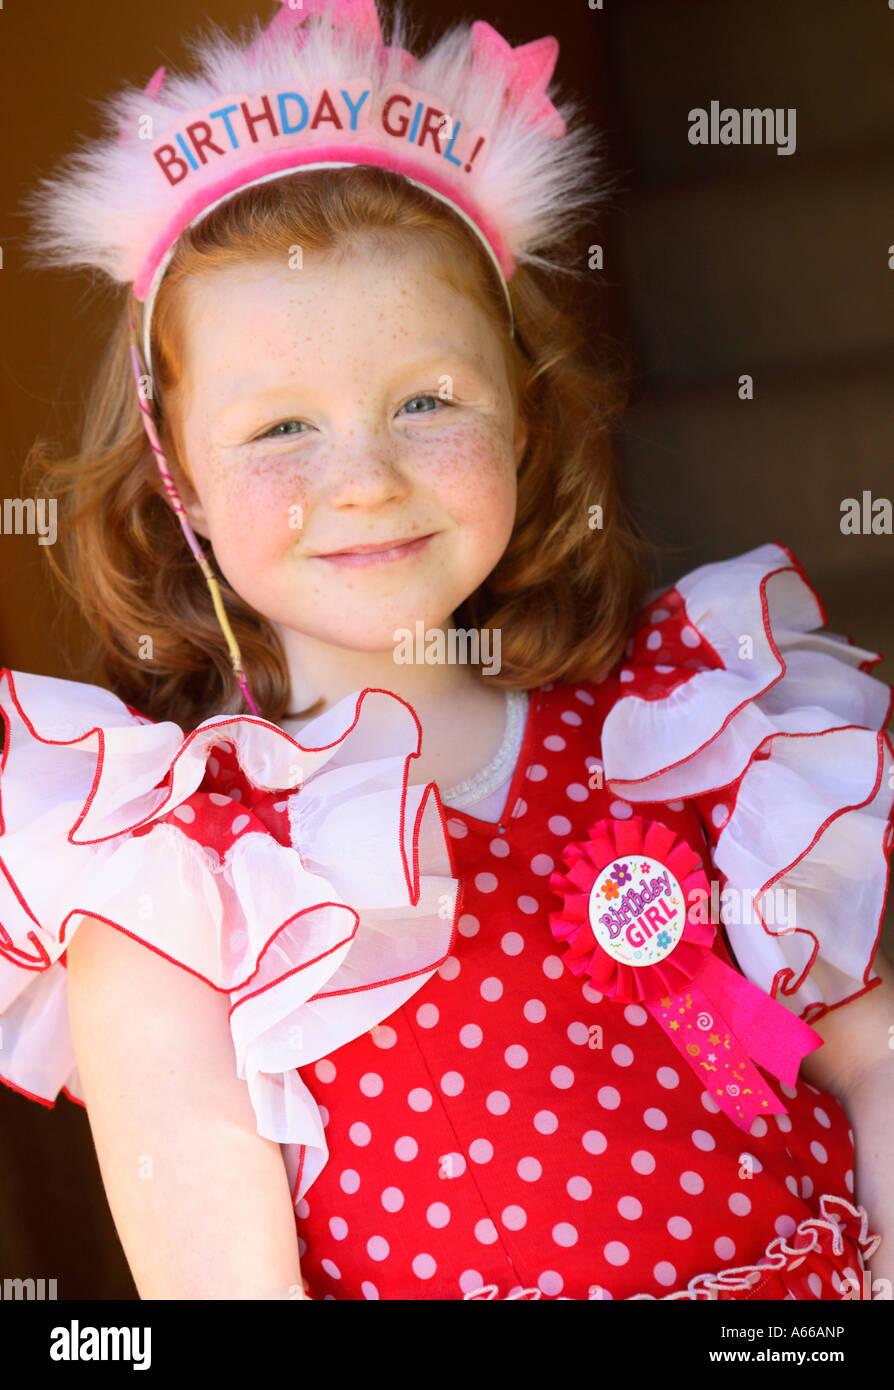 Birthday Badge Birthday Girl Stockfotos & Birthday Badge Birthday ...